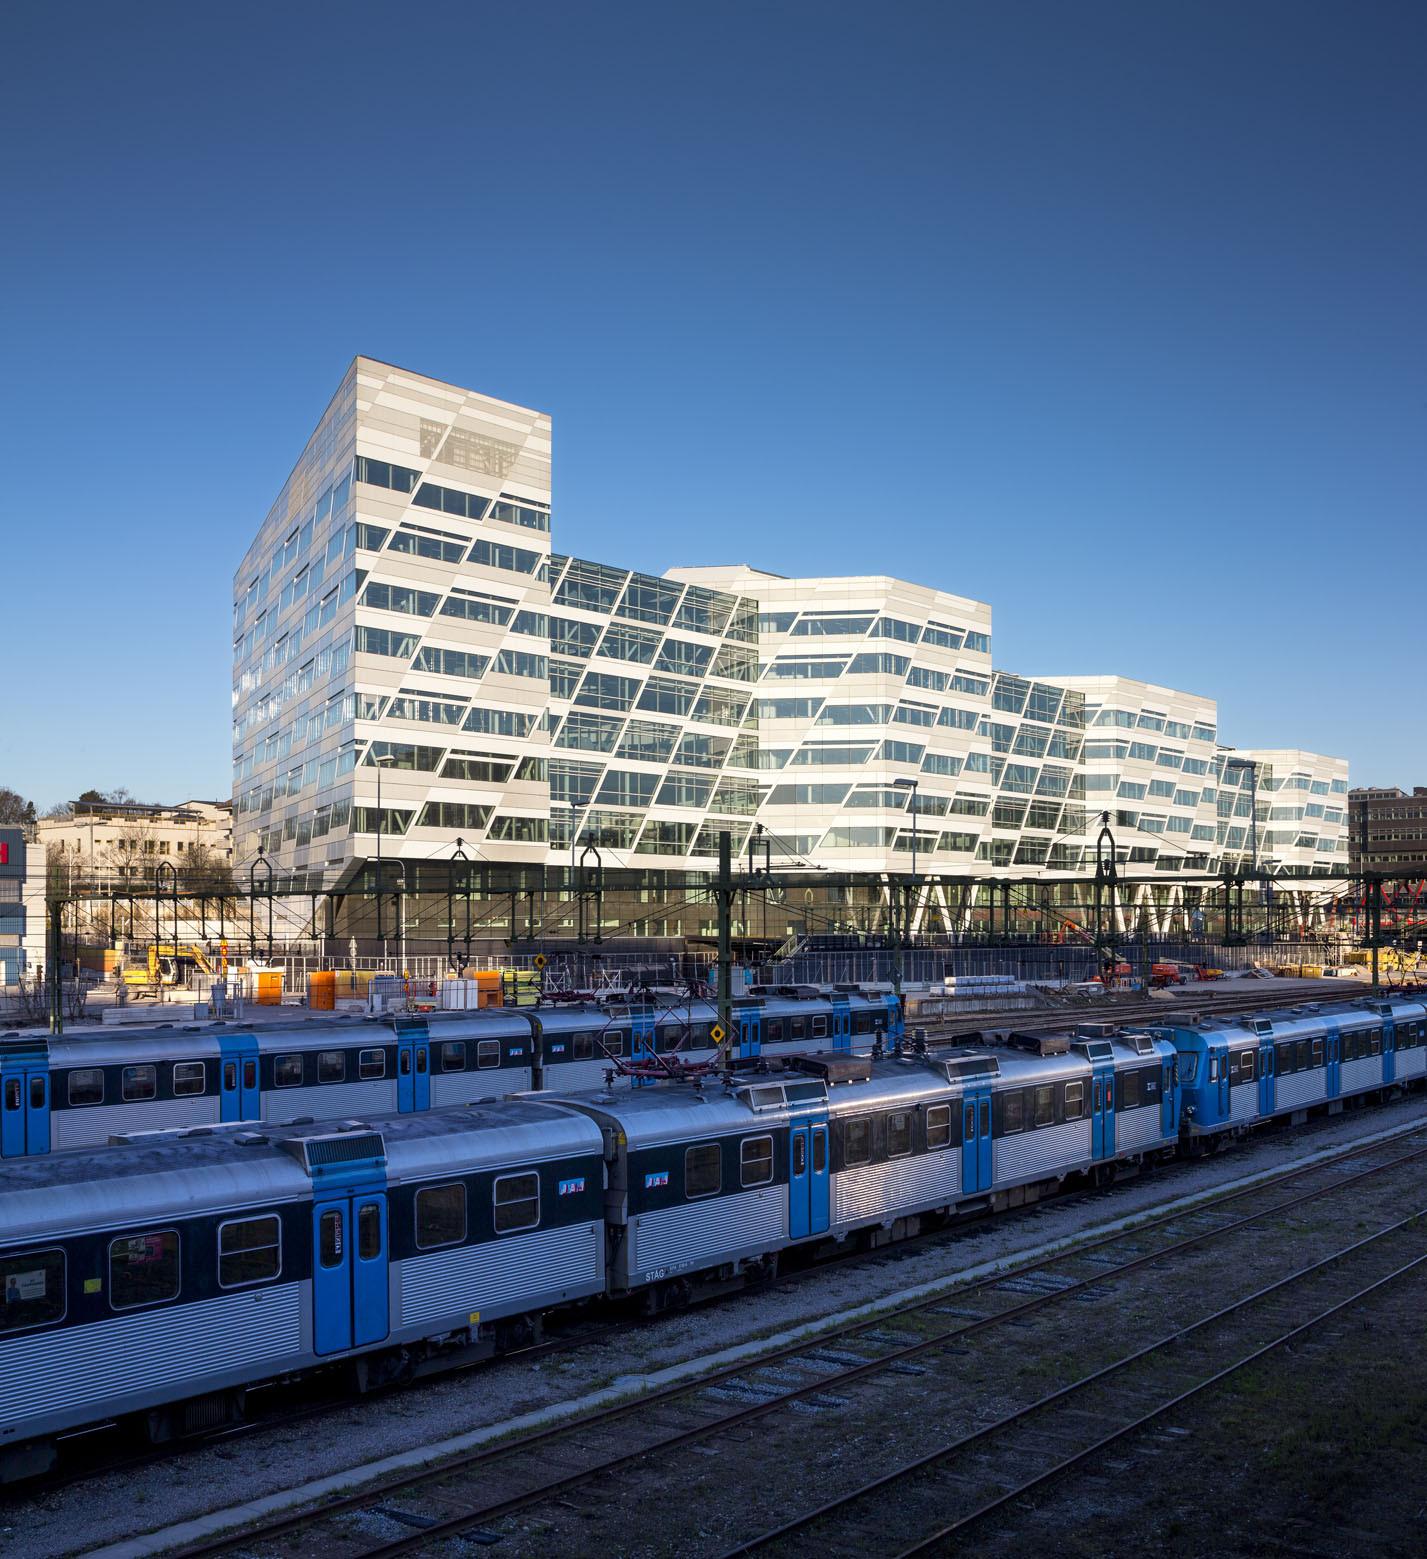 wswedbank